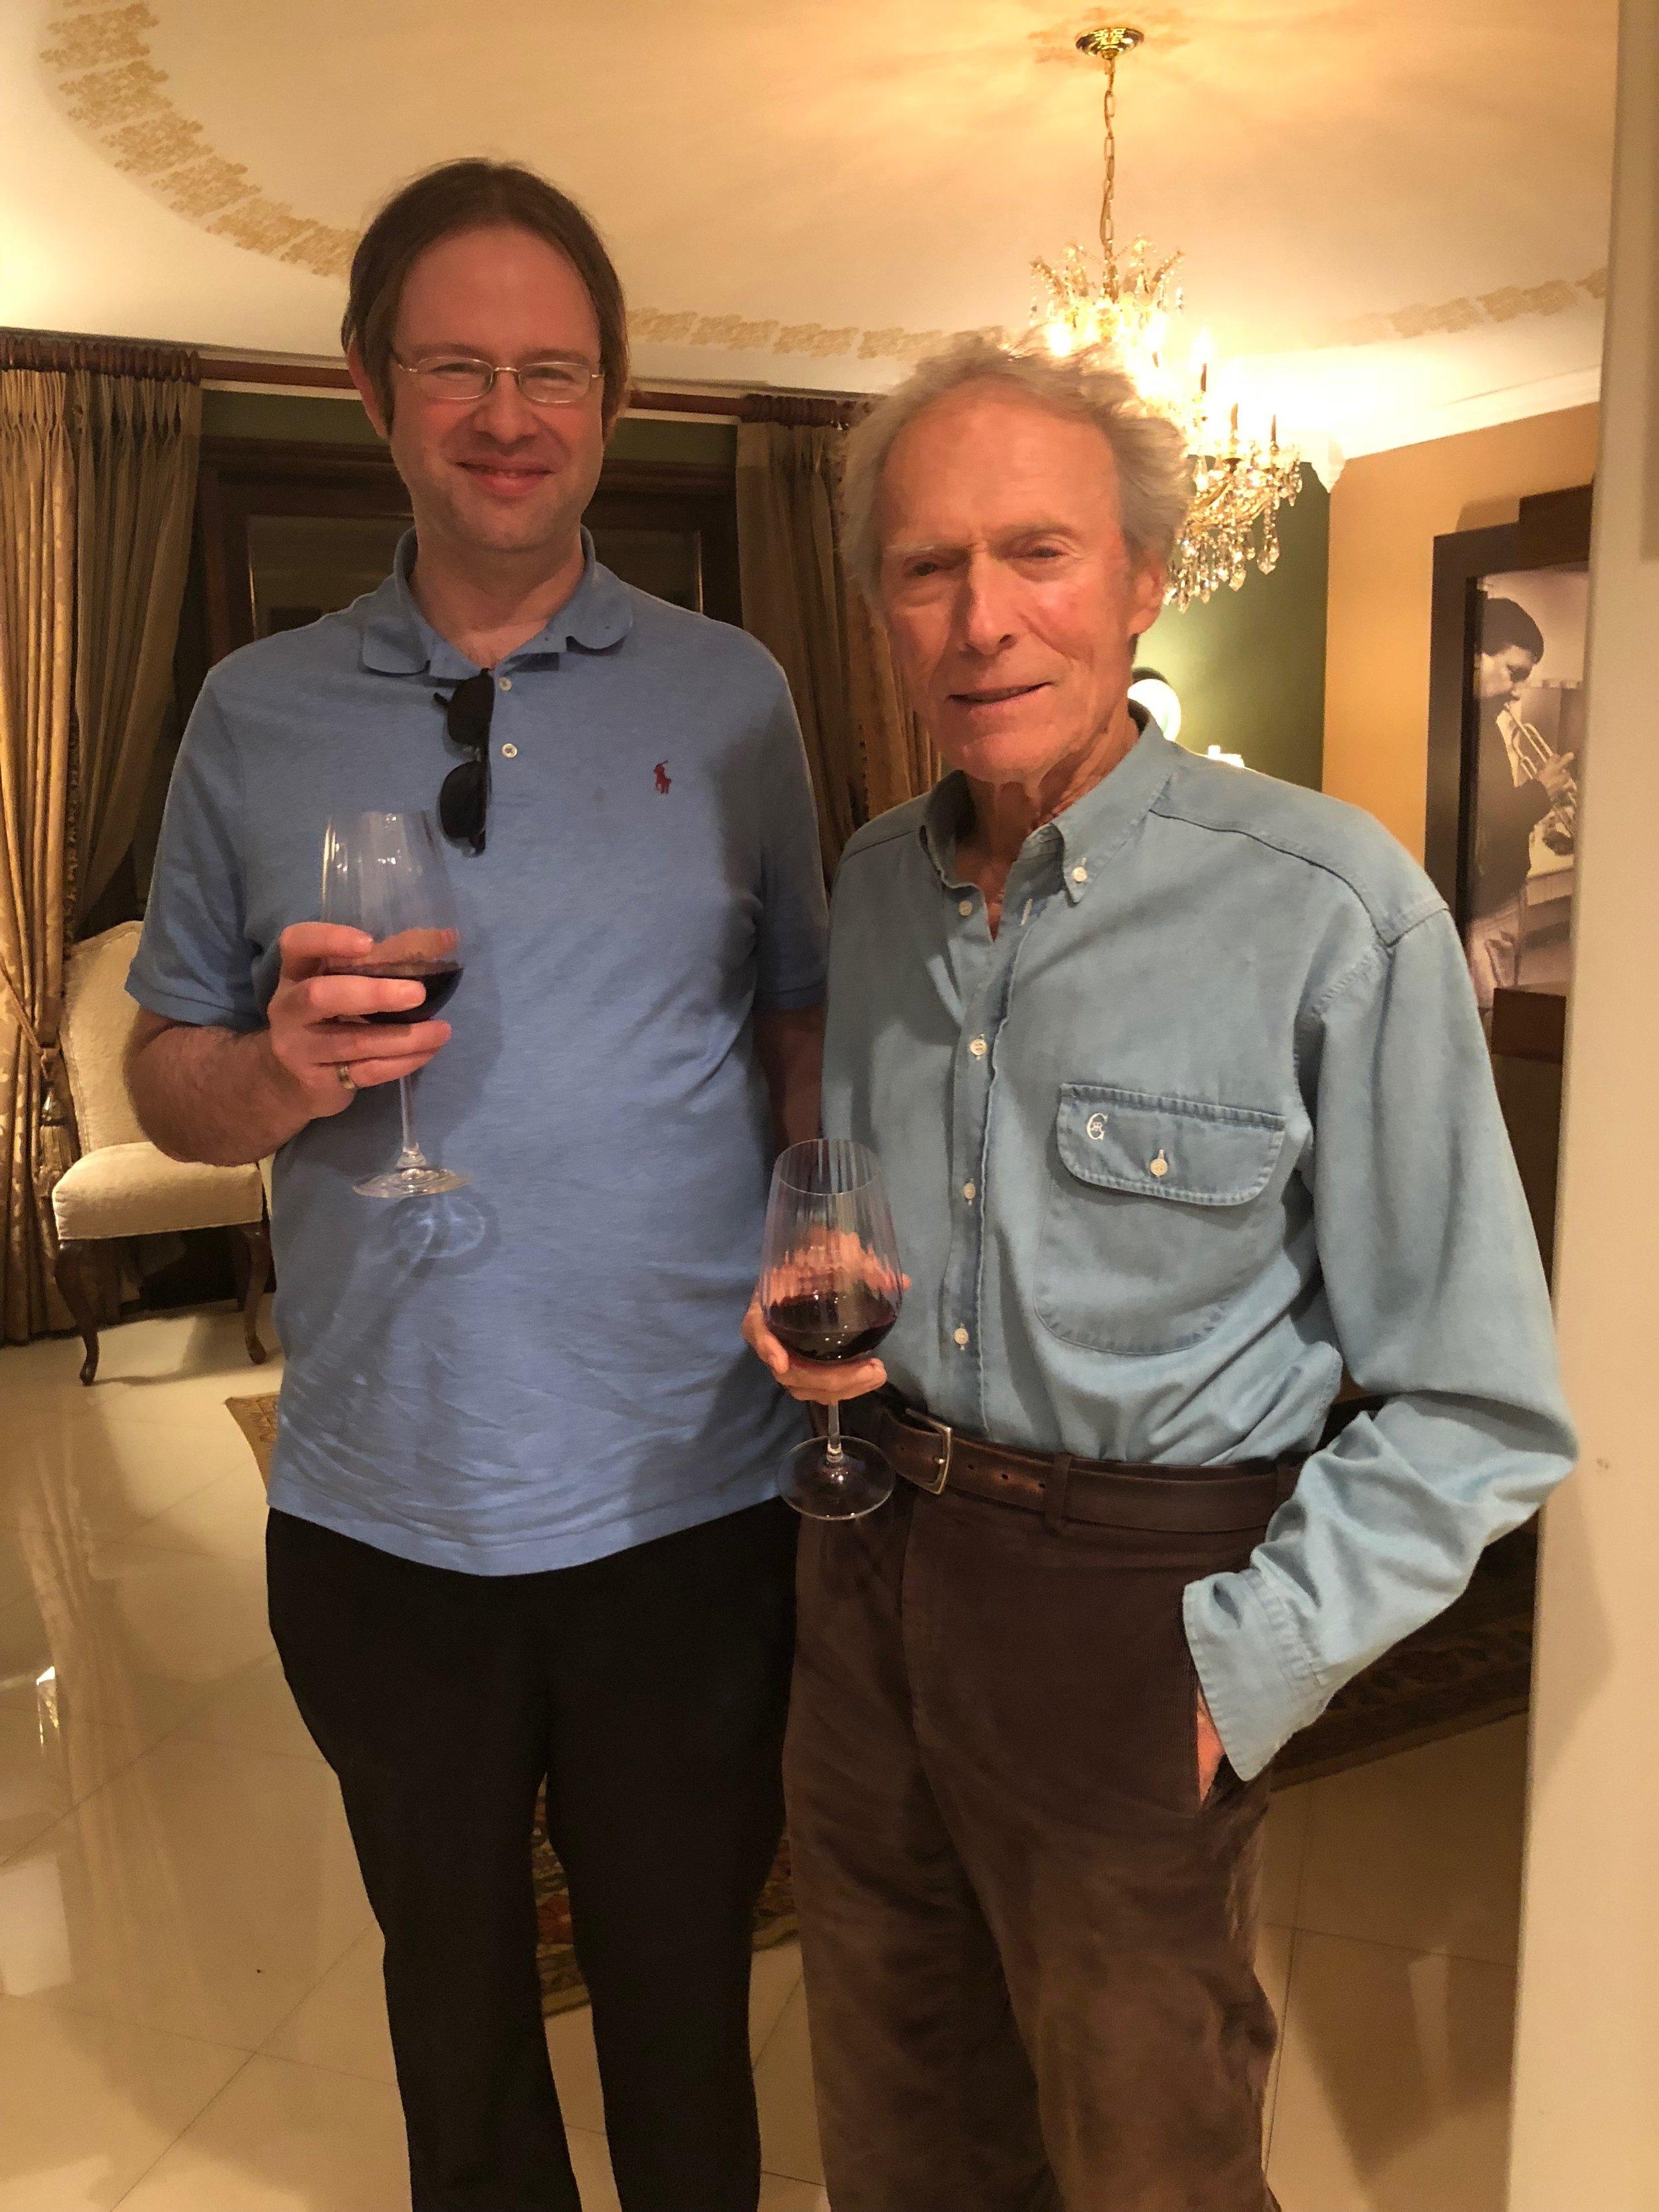 Kaska with Clint Eastwood